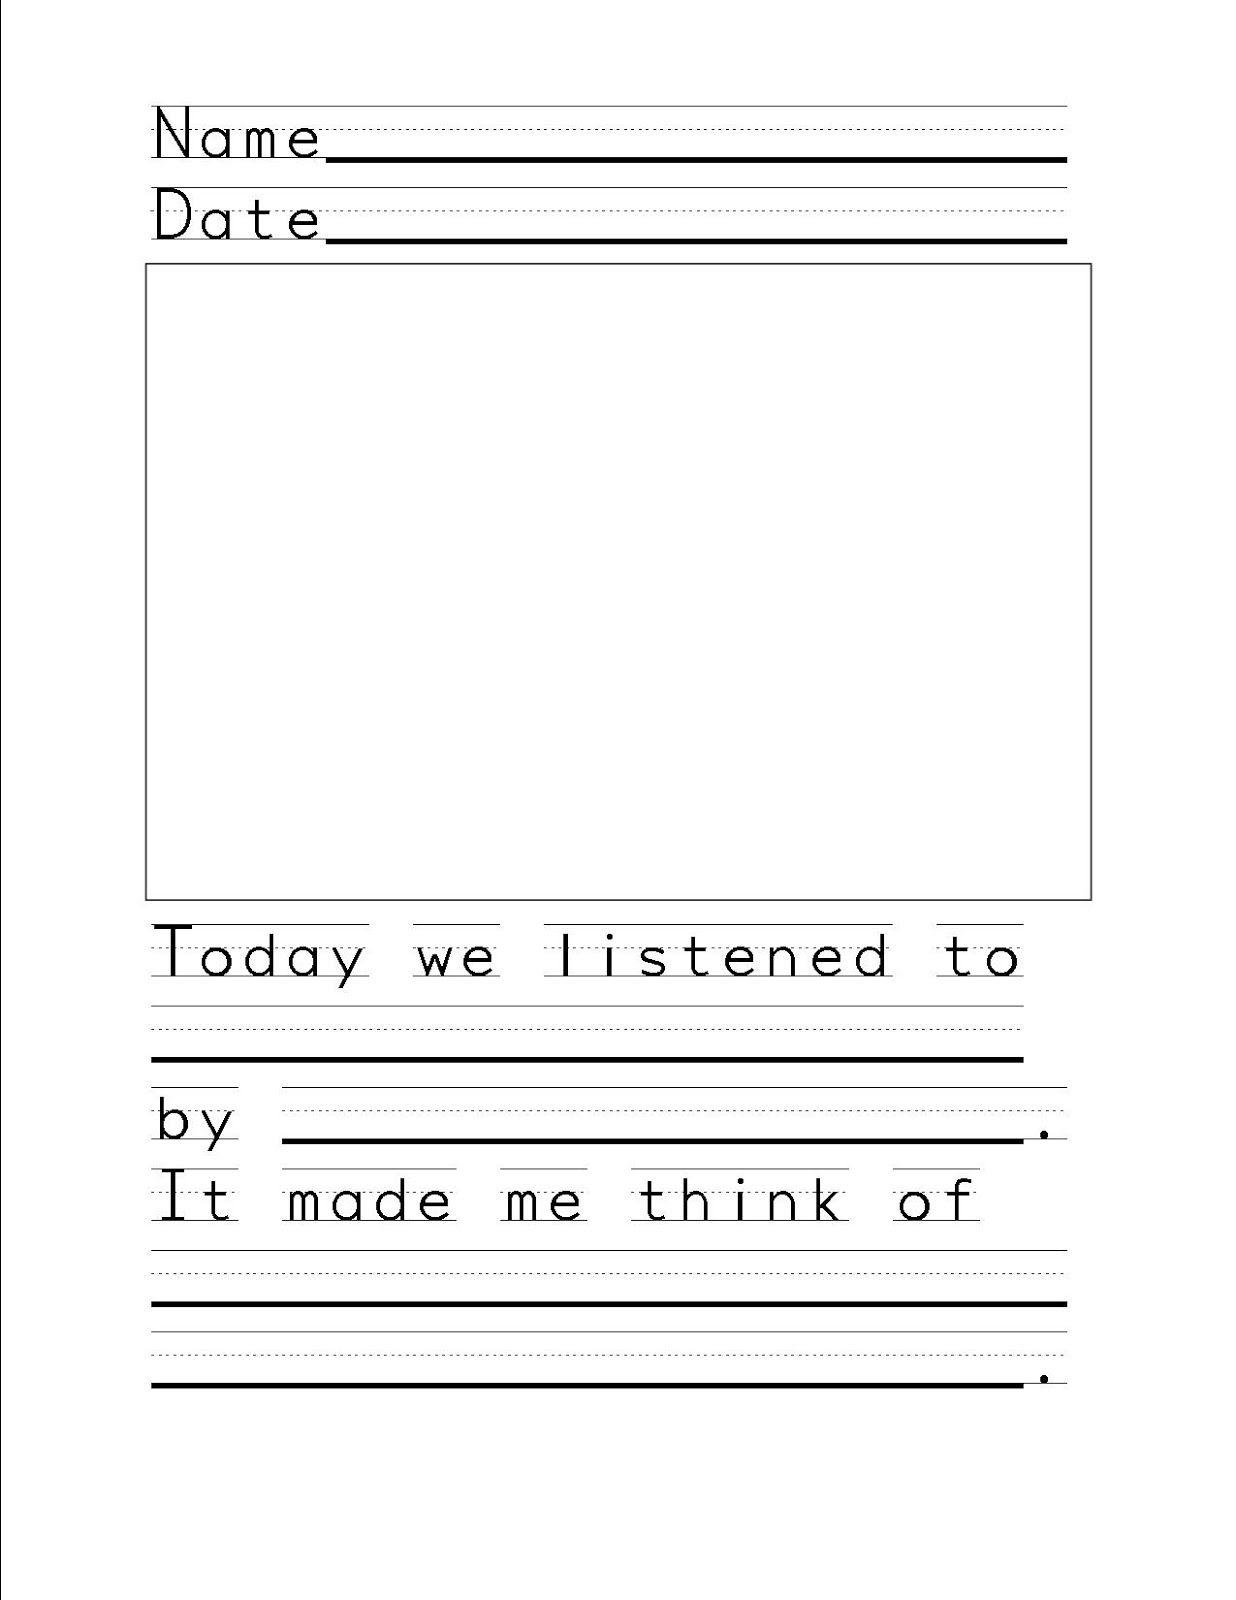 So La Mi Elementary Music Class Listening Response